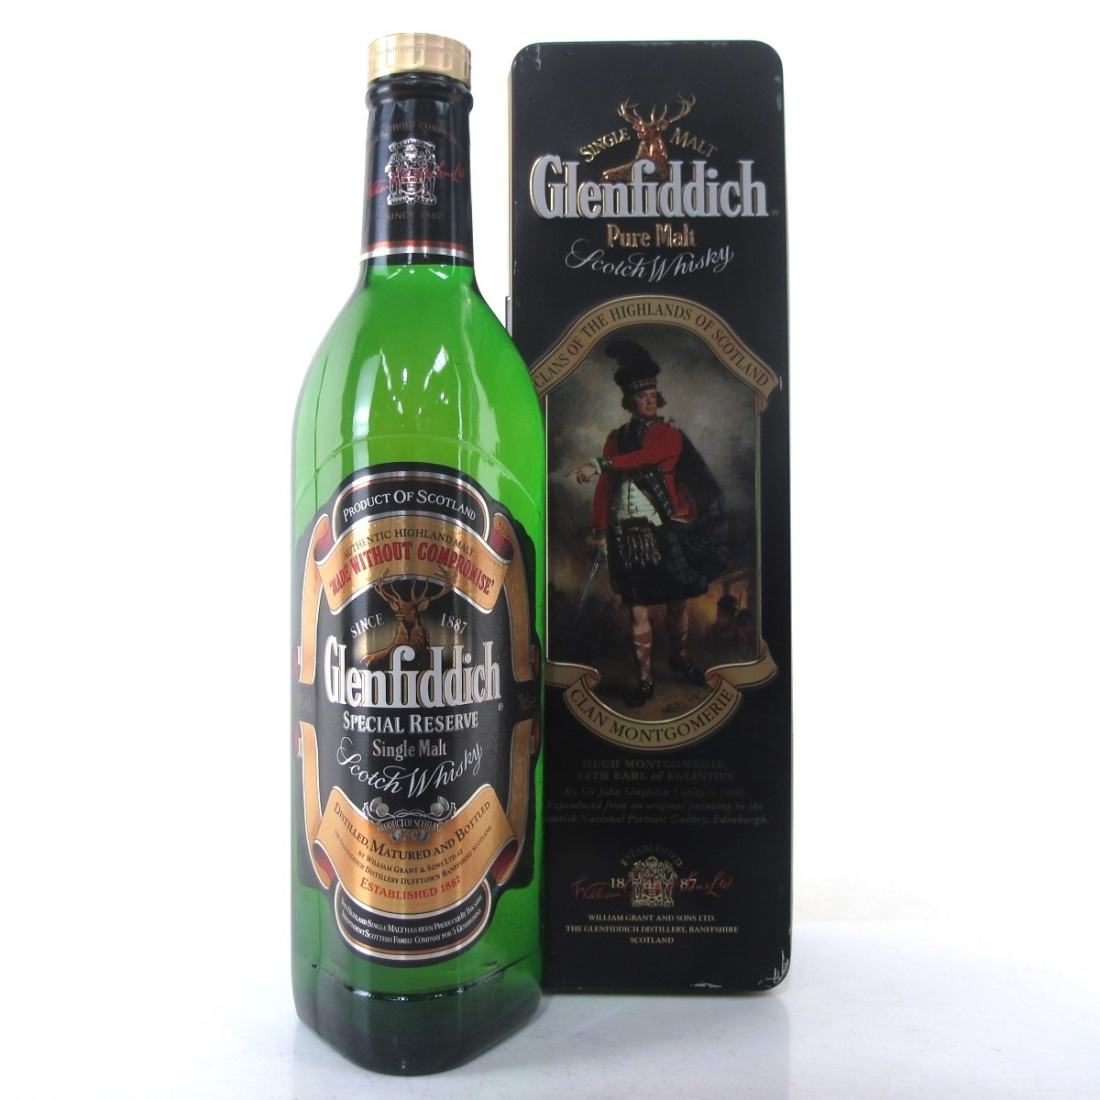 Glenfiddich Clans of the Highlands / Clan Montgomerie